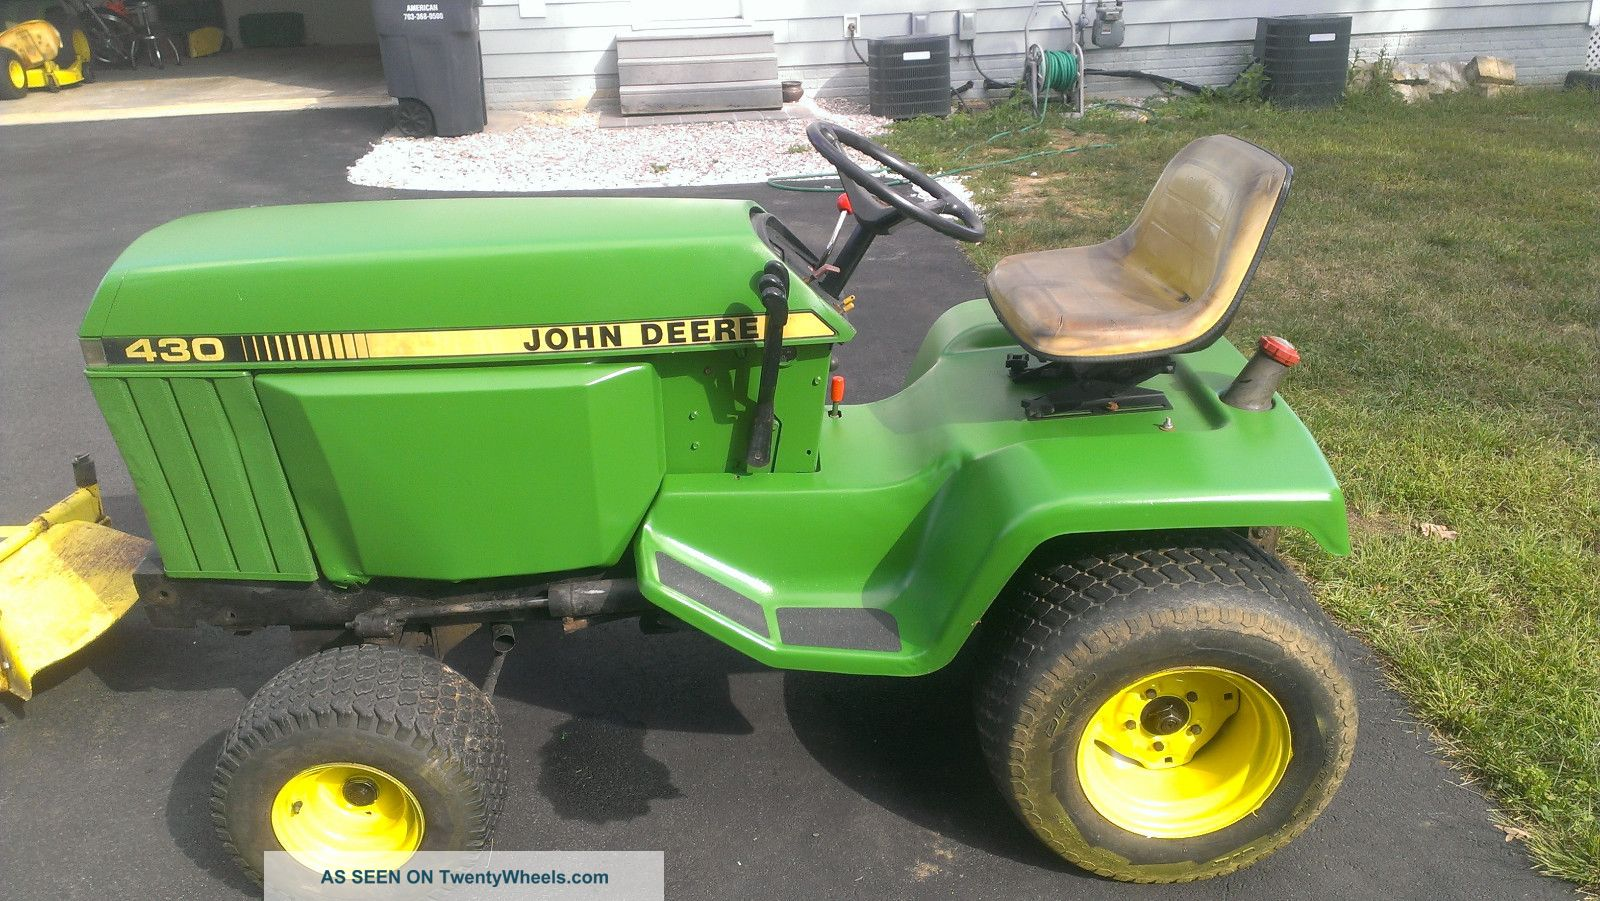 john deere 60 tractor wiring diagram lo 7953  john deere lawn mowers on 430 john deere lawn mower  lo 7953  john deere lawn mowers on 430